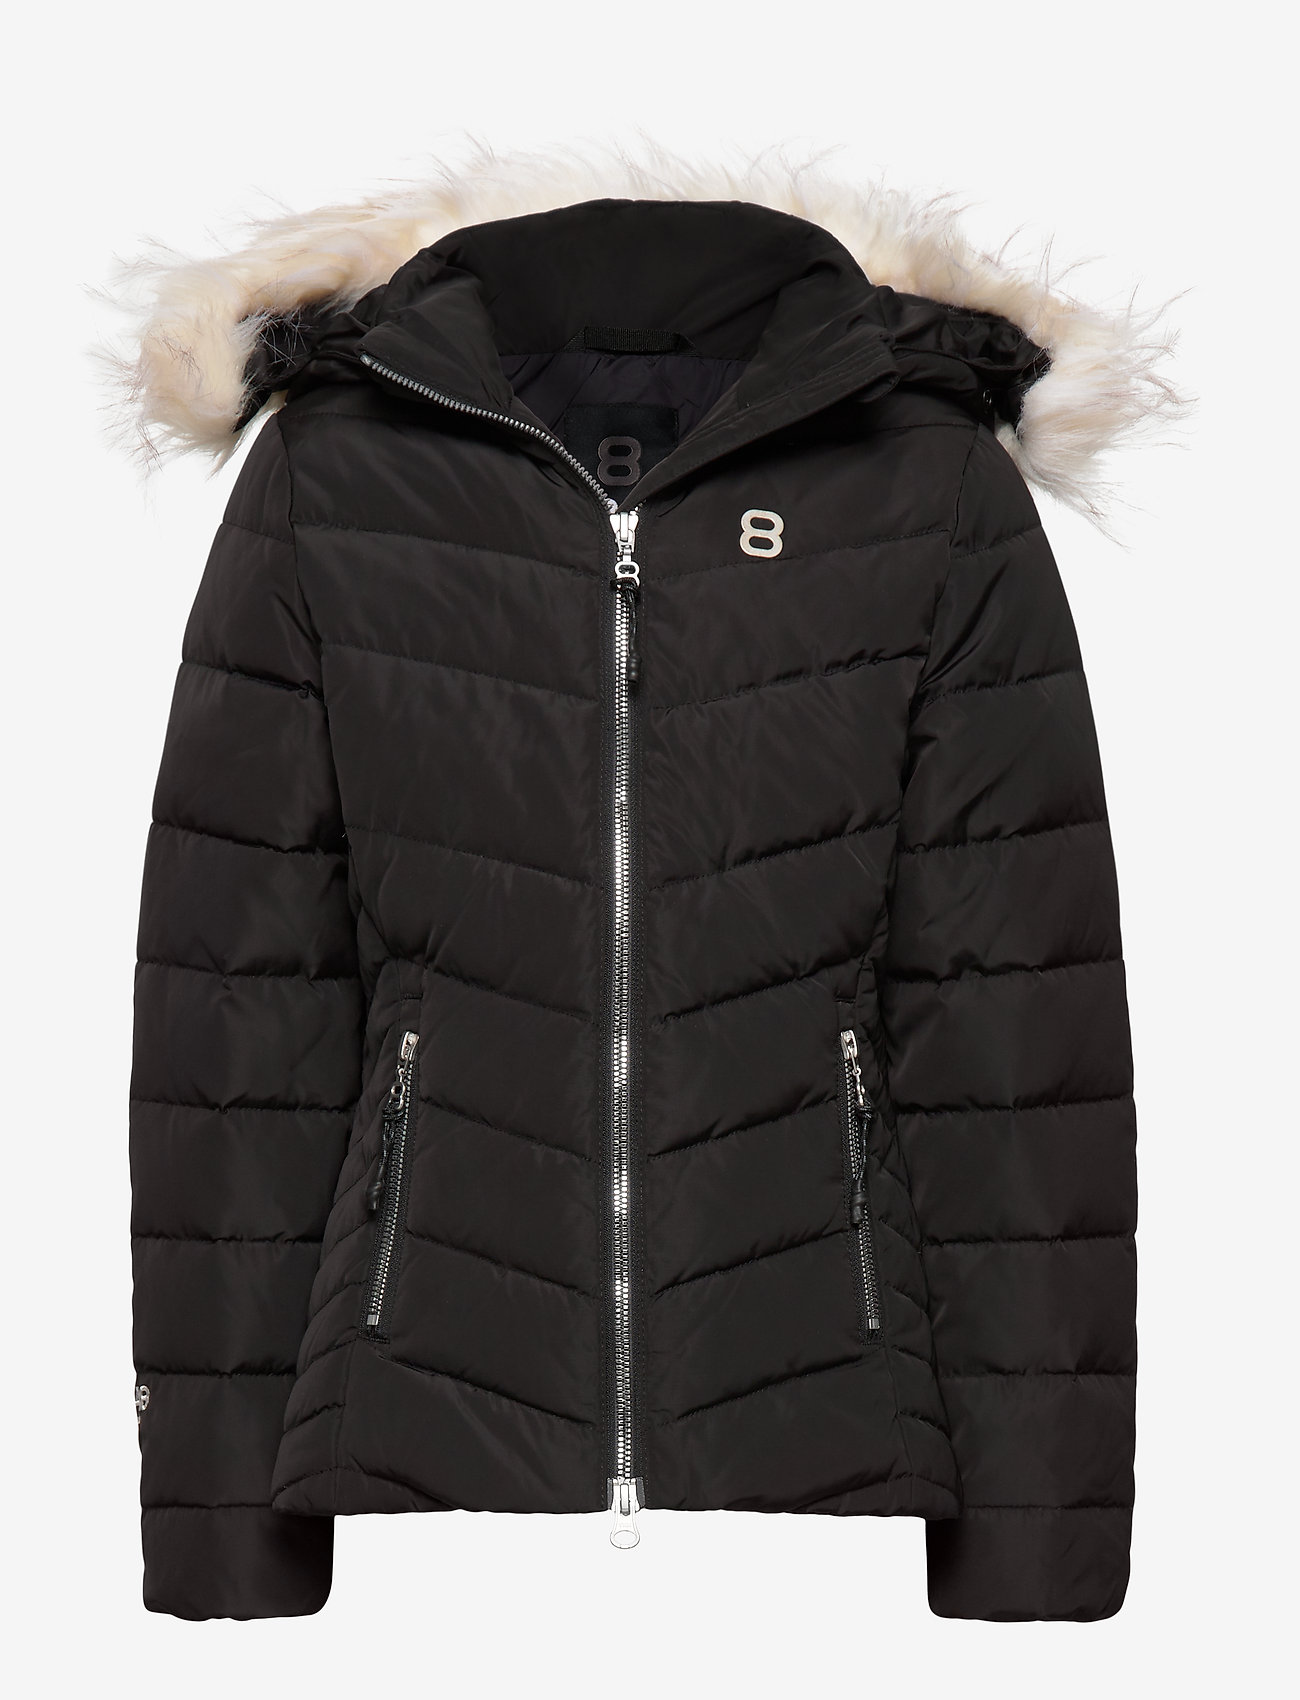 8848 Altitude - Vera JR Jacket - kurtka zimowa - black - 0